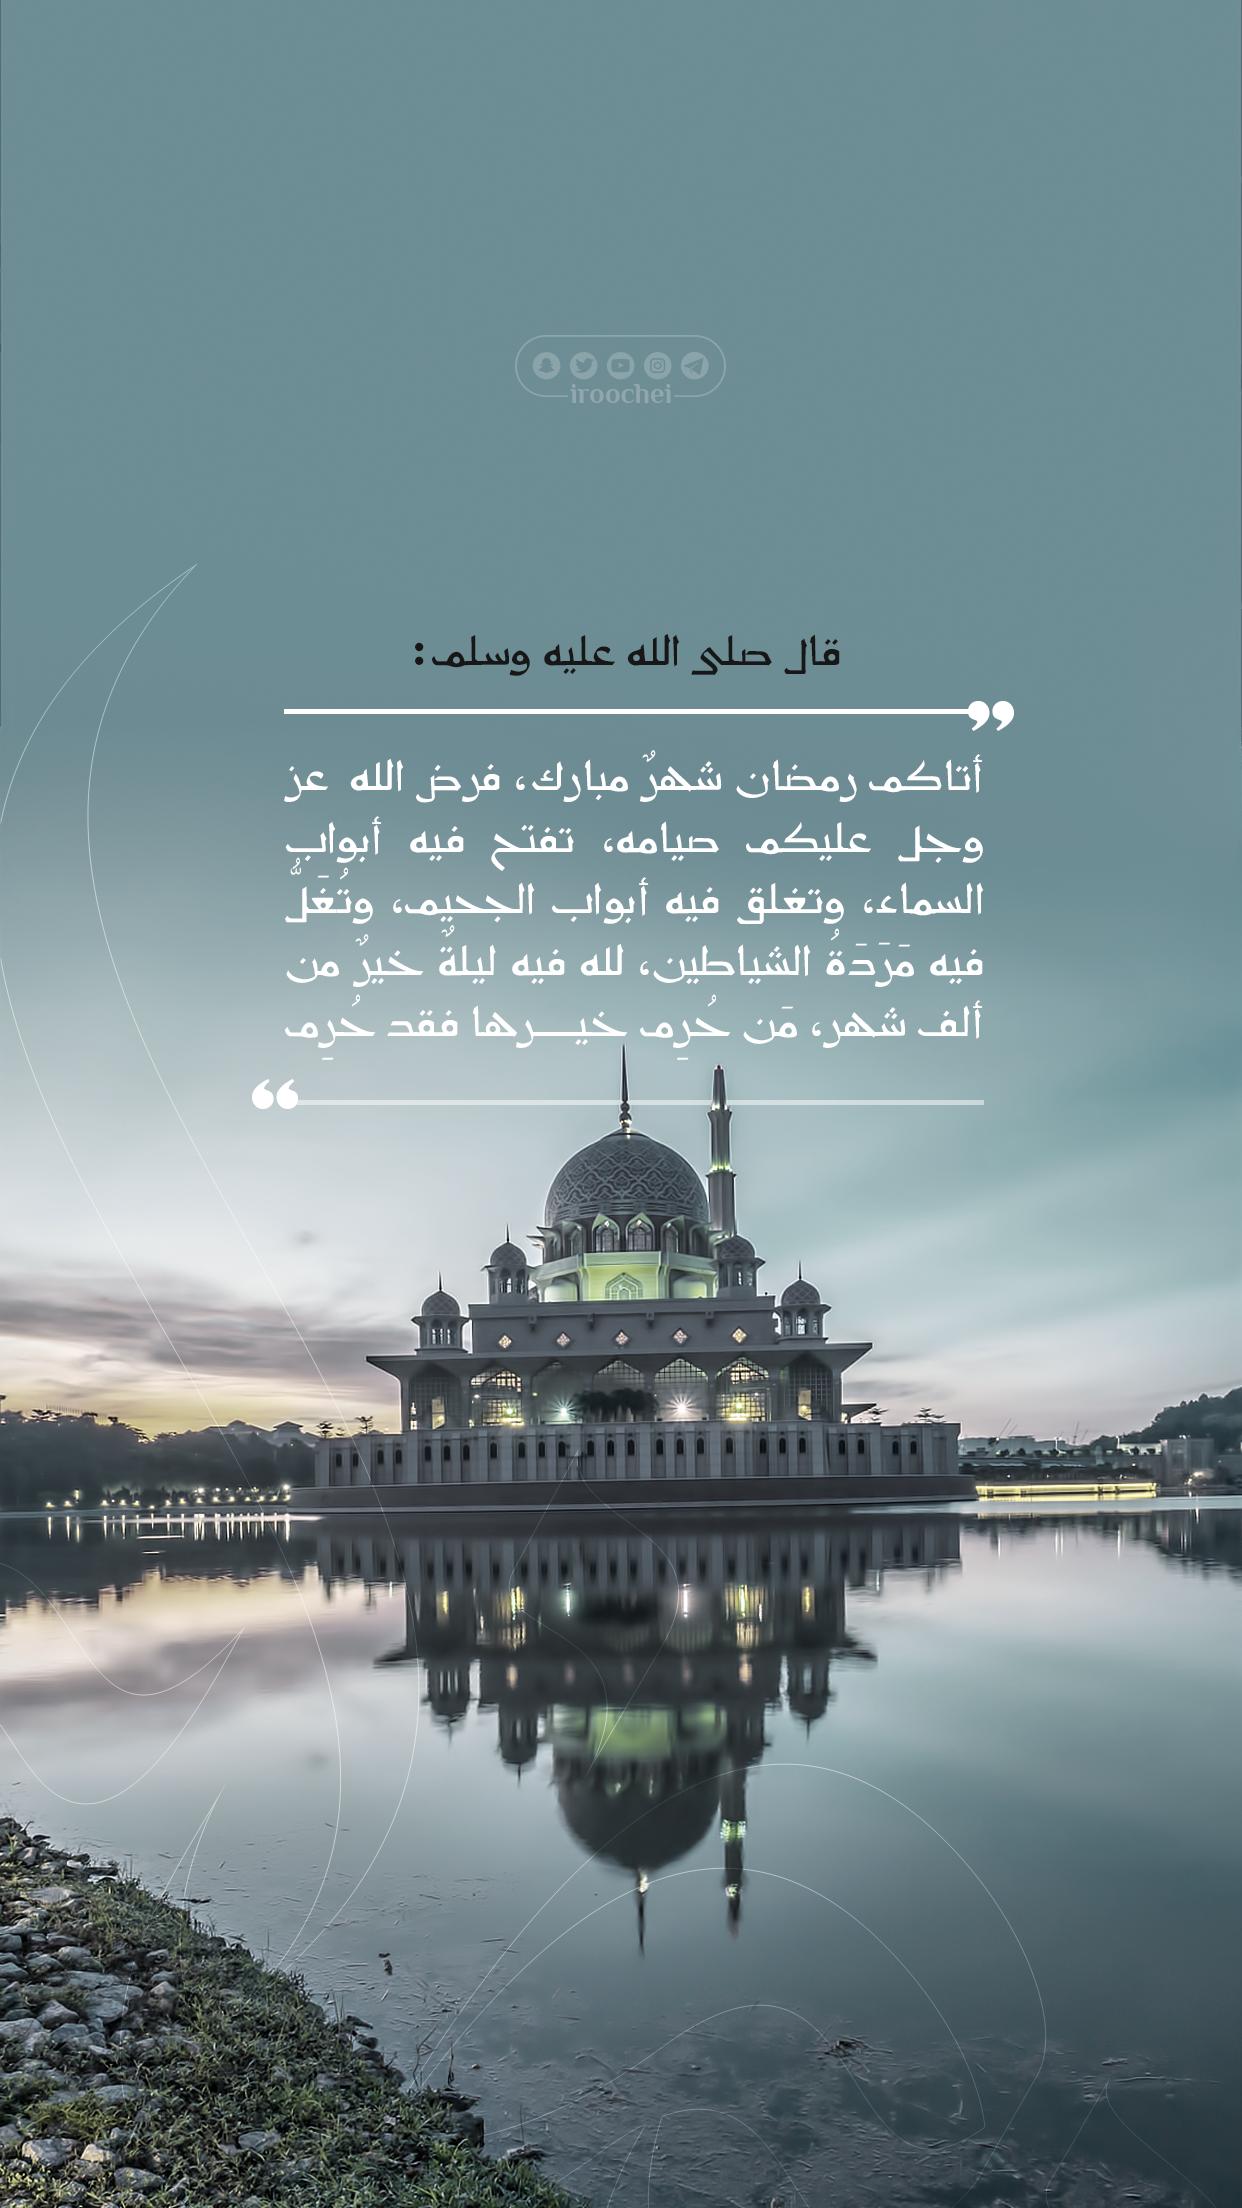 حديث أتاكم رمضان Islamic Pictures Islamic Paintings Ramadan Background